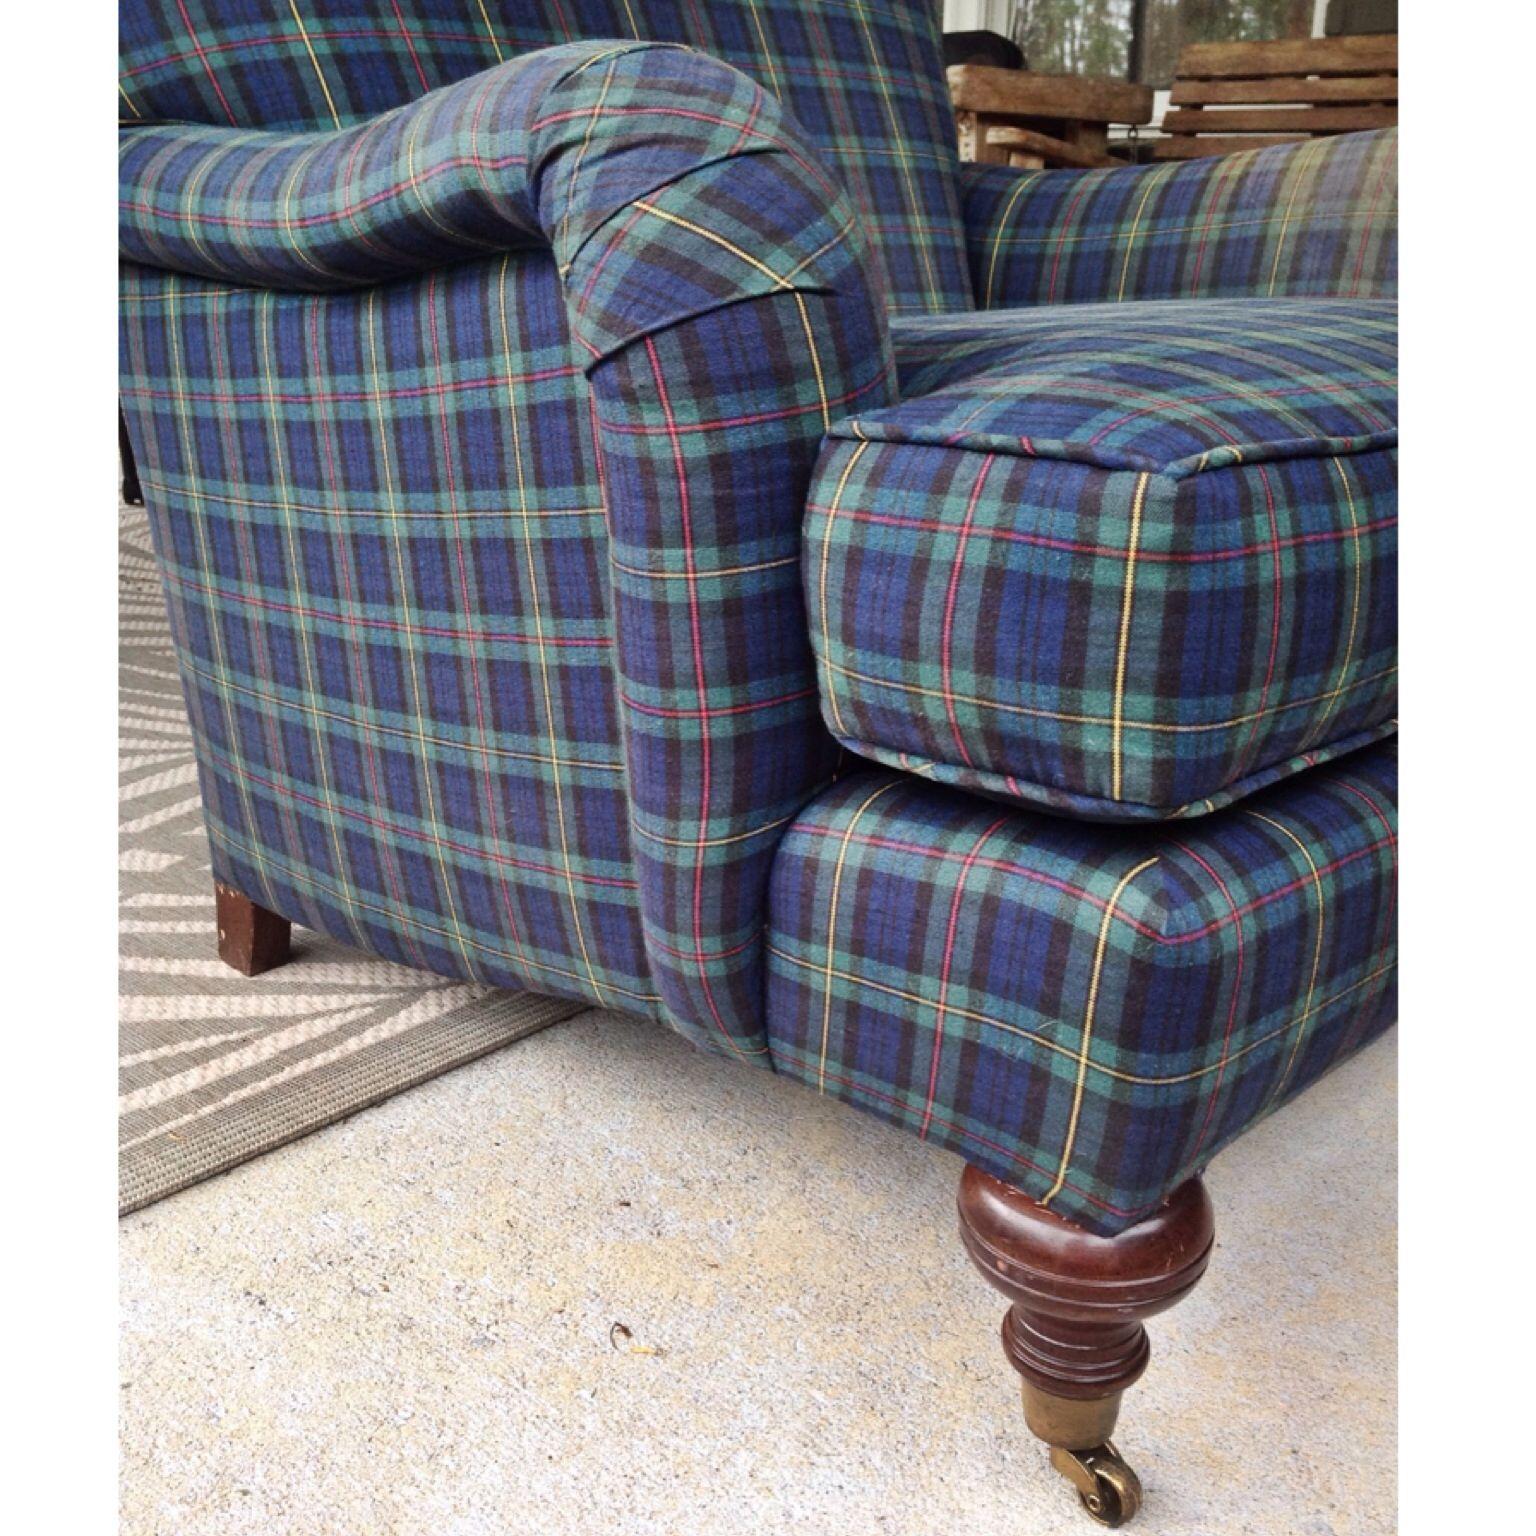 Best Blackwatch Tartan Plaid Club Chair Plaid Decor Plaid 640 x 480